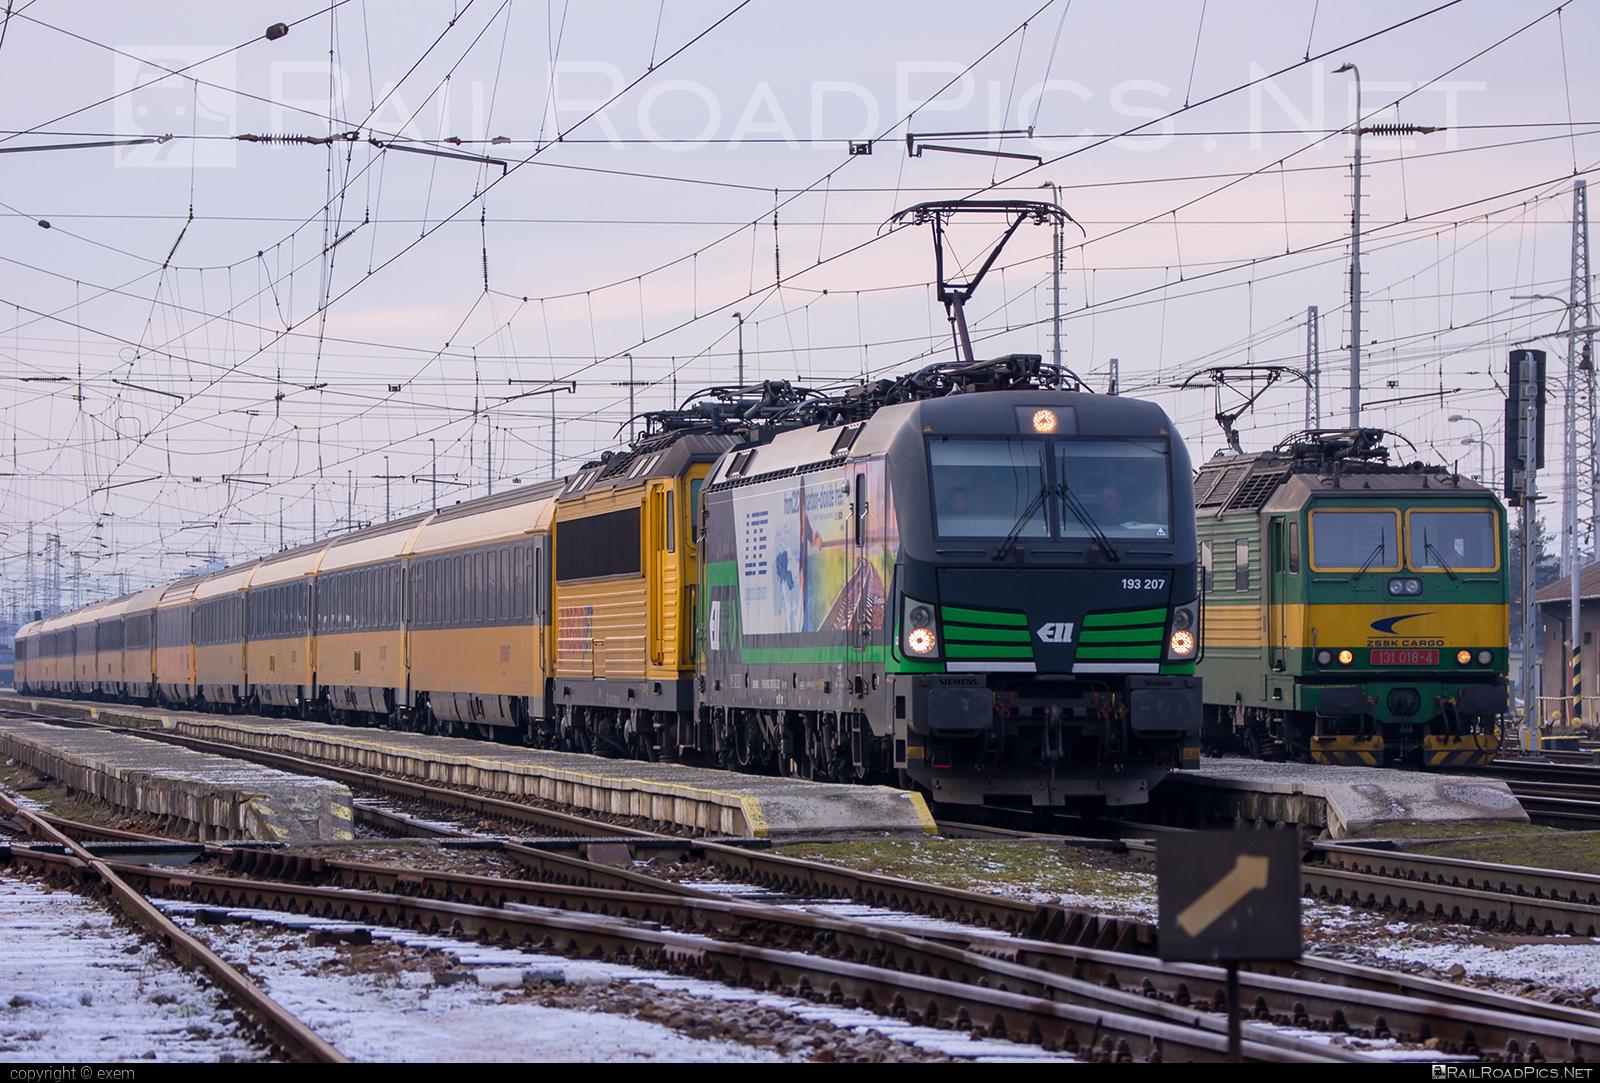 Siemens Vectron MS - 193 207 operated by RegioJet, a.s. #ell #ellgermany #eloc #europeanlocomotiveleasing #regiojet #siemens #siemensvectron #siemensvectronms #vectron #vectronms